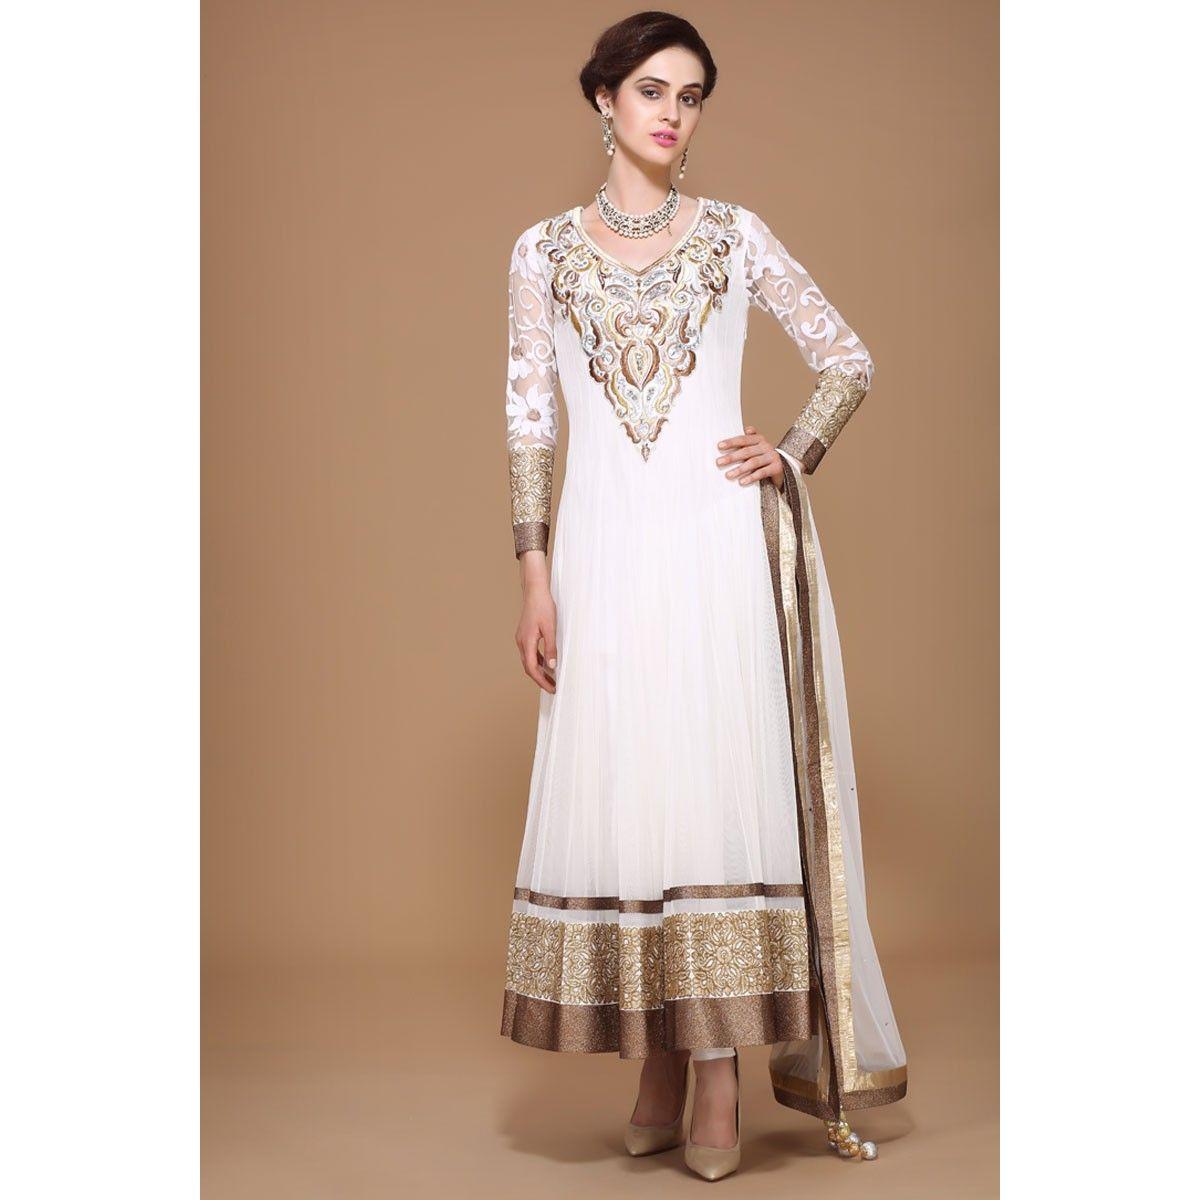 Online shopping for designer anarkali suits, salwar kameez, saree, Indian & Pakistani dresses, sari, Asian clothes, wedding bridal lehenga for express delivery in UK. Visit andaazfashion.co.uk.